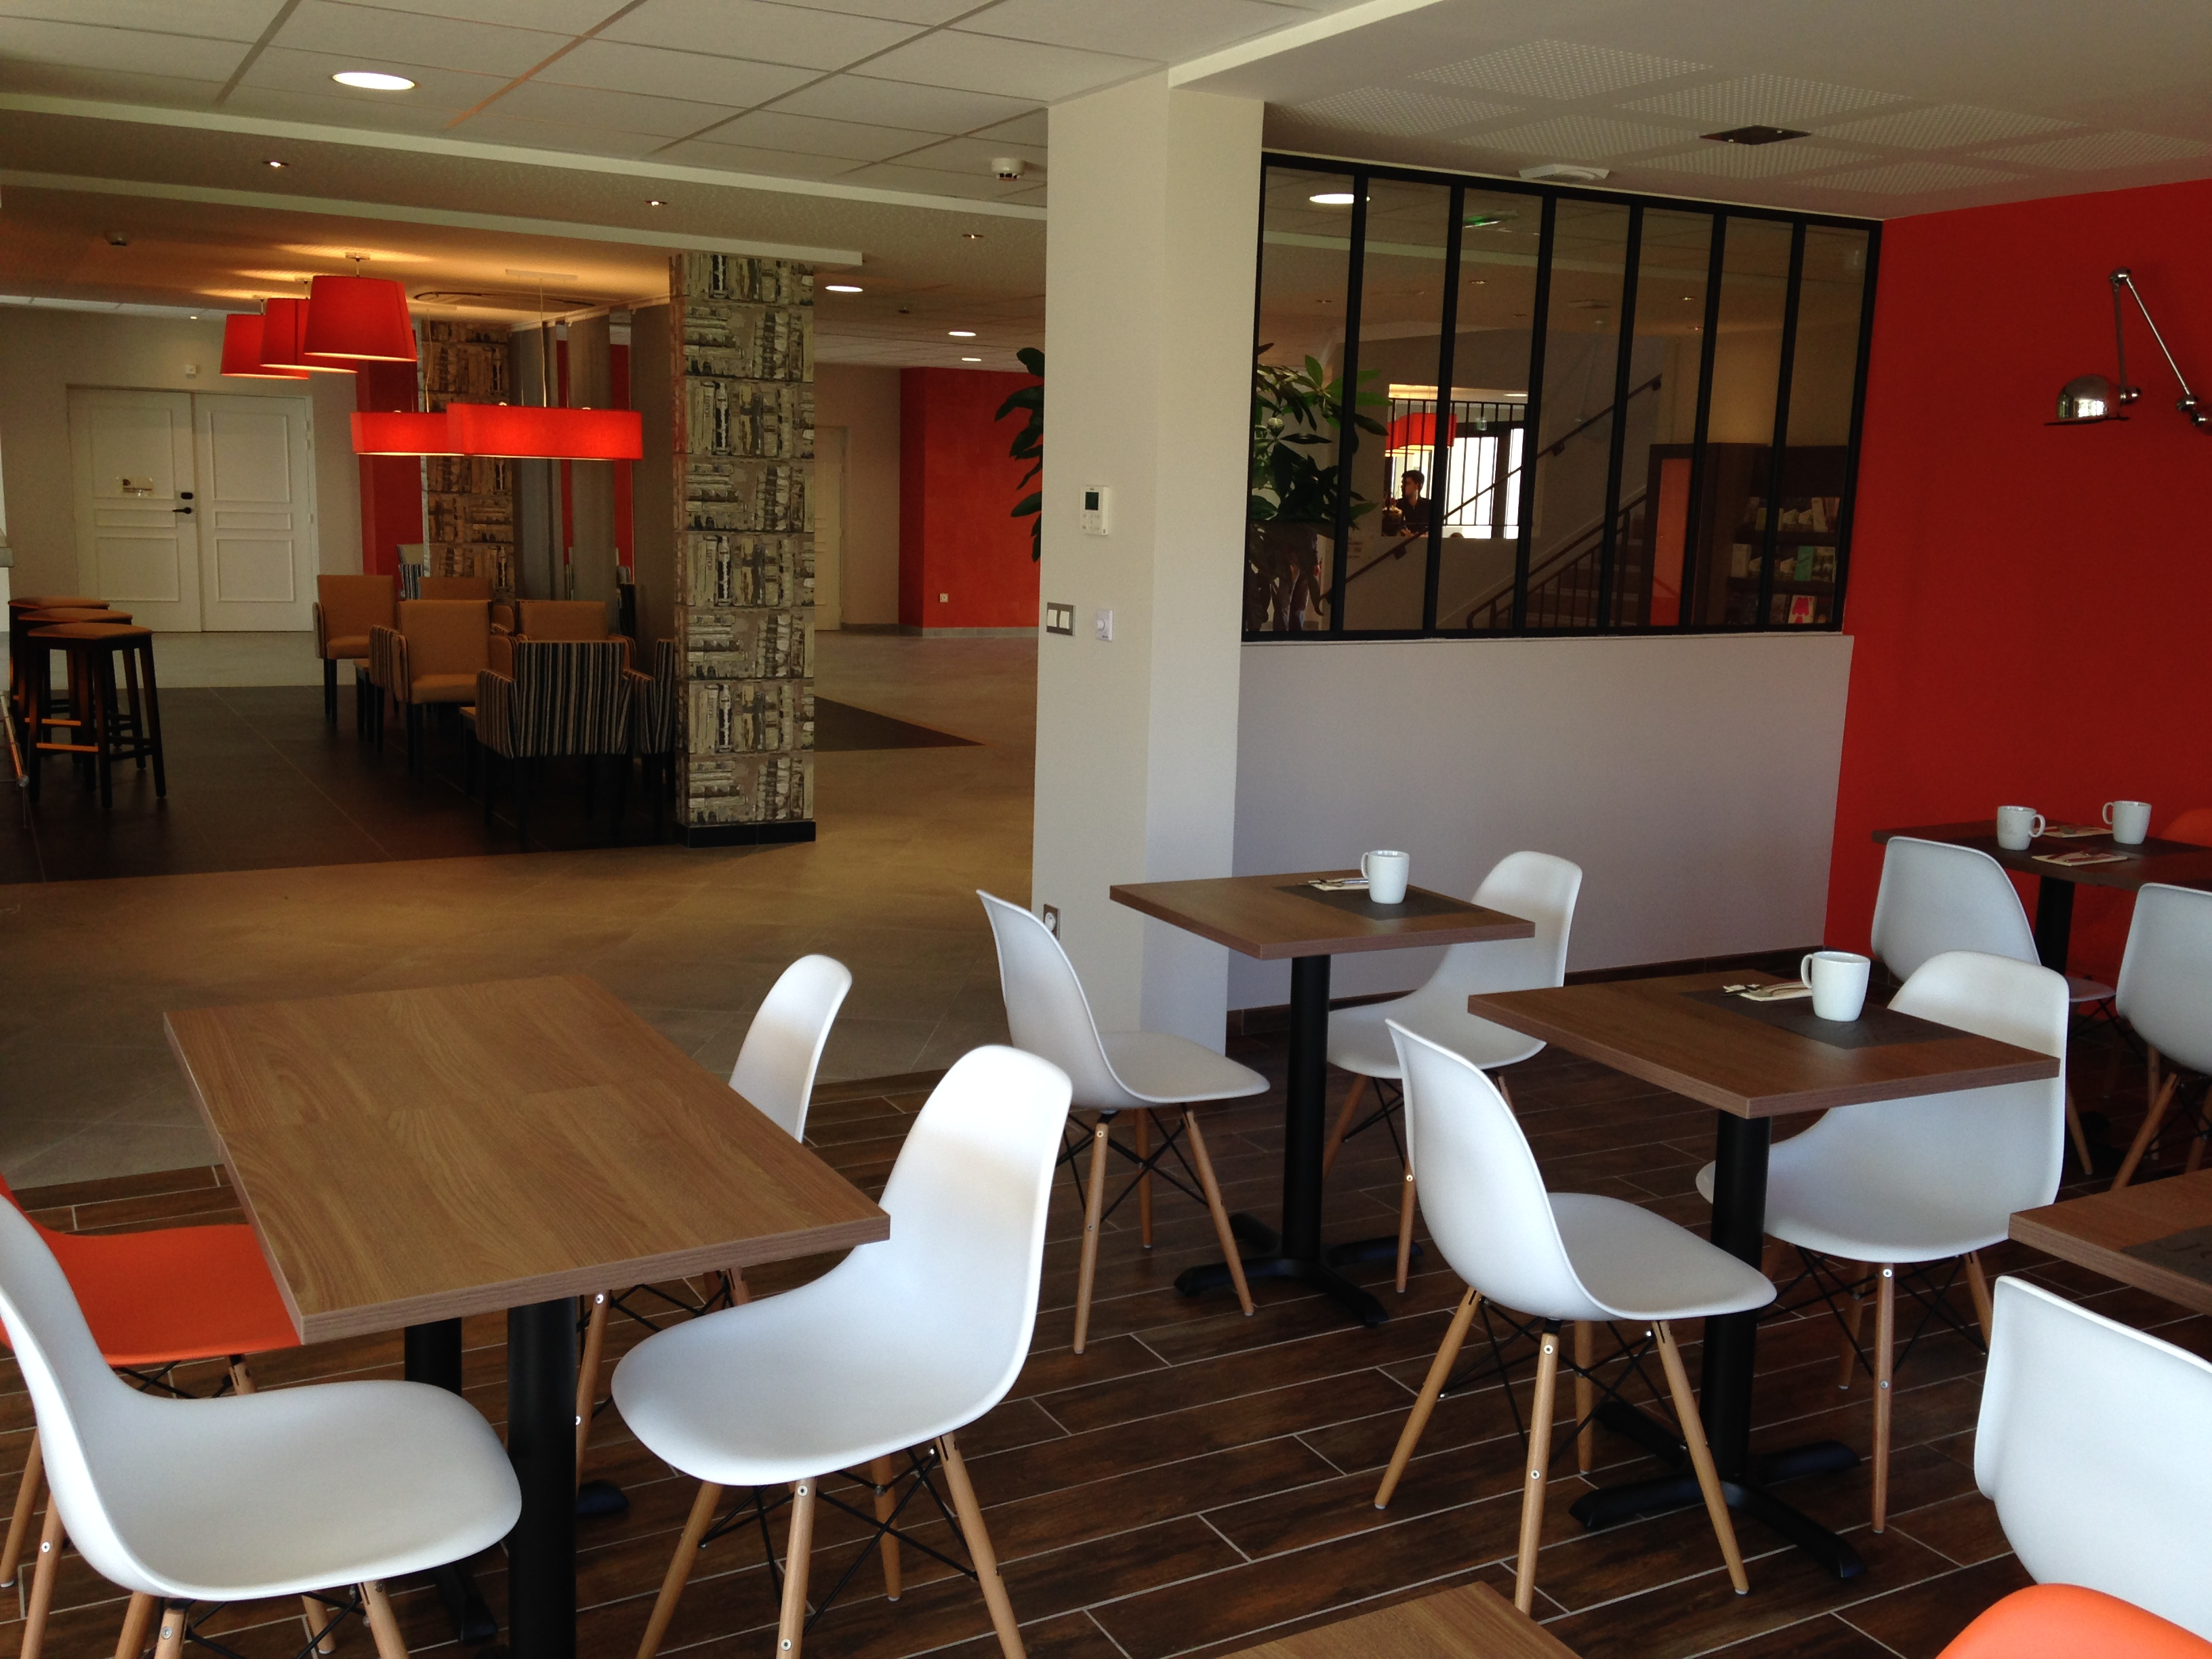 hotel kyriad angers beaucouze - géraldine fourny - decoratrice d interieur nantes 44 - restaurant 4